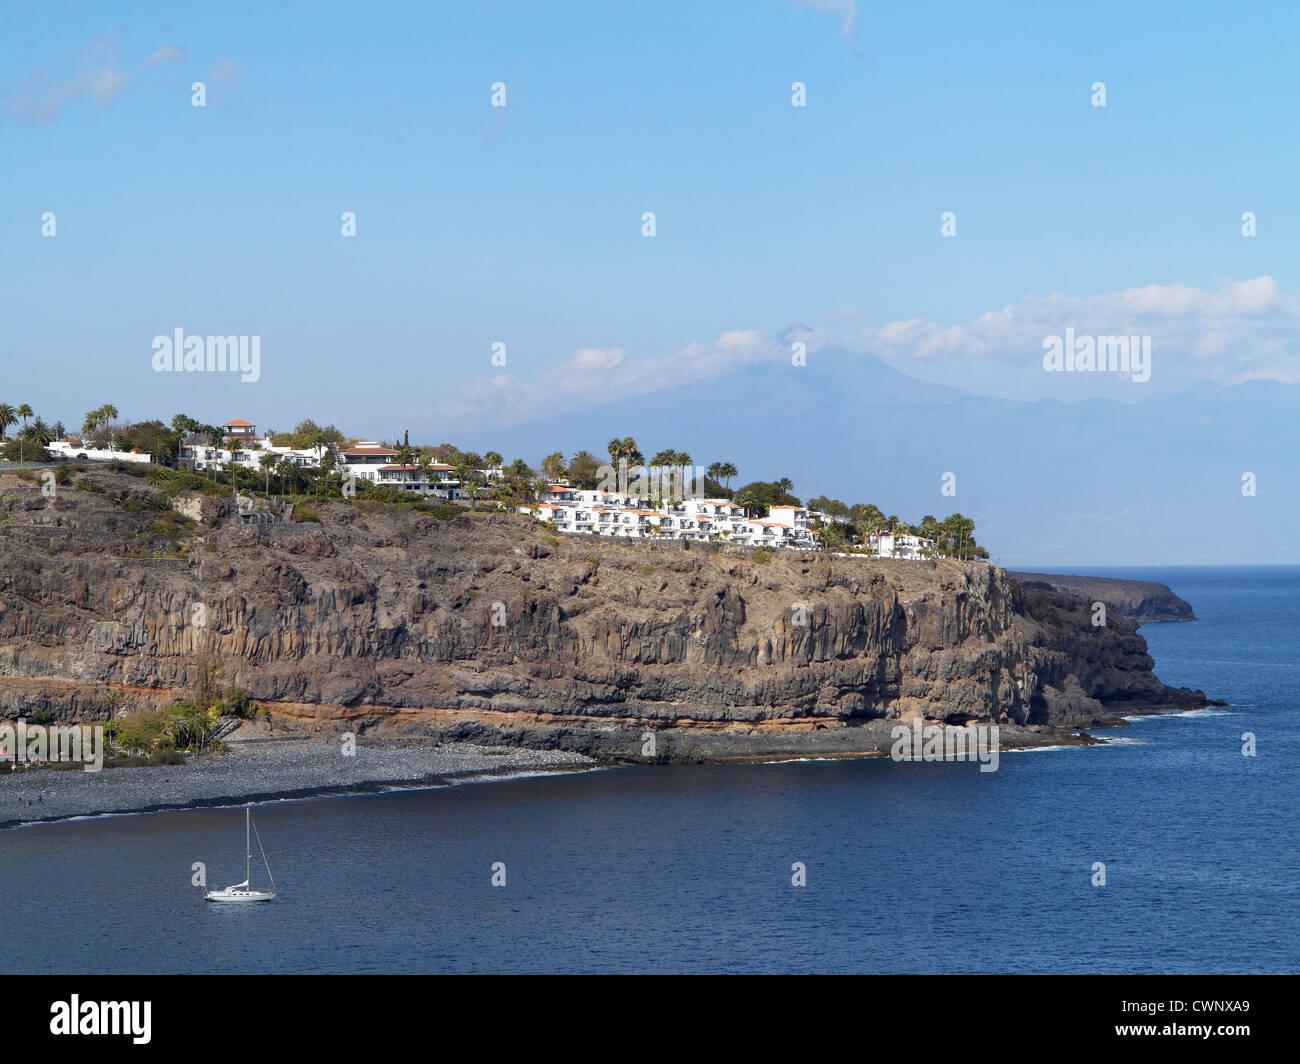 Spain La Gomera View Of Hotel Jardin Tecina On Cliff Stock Photo